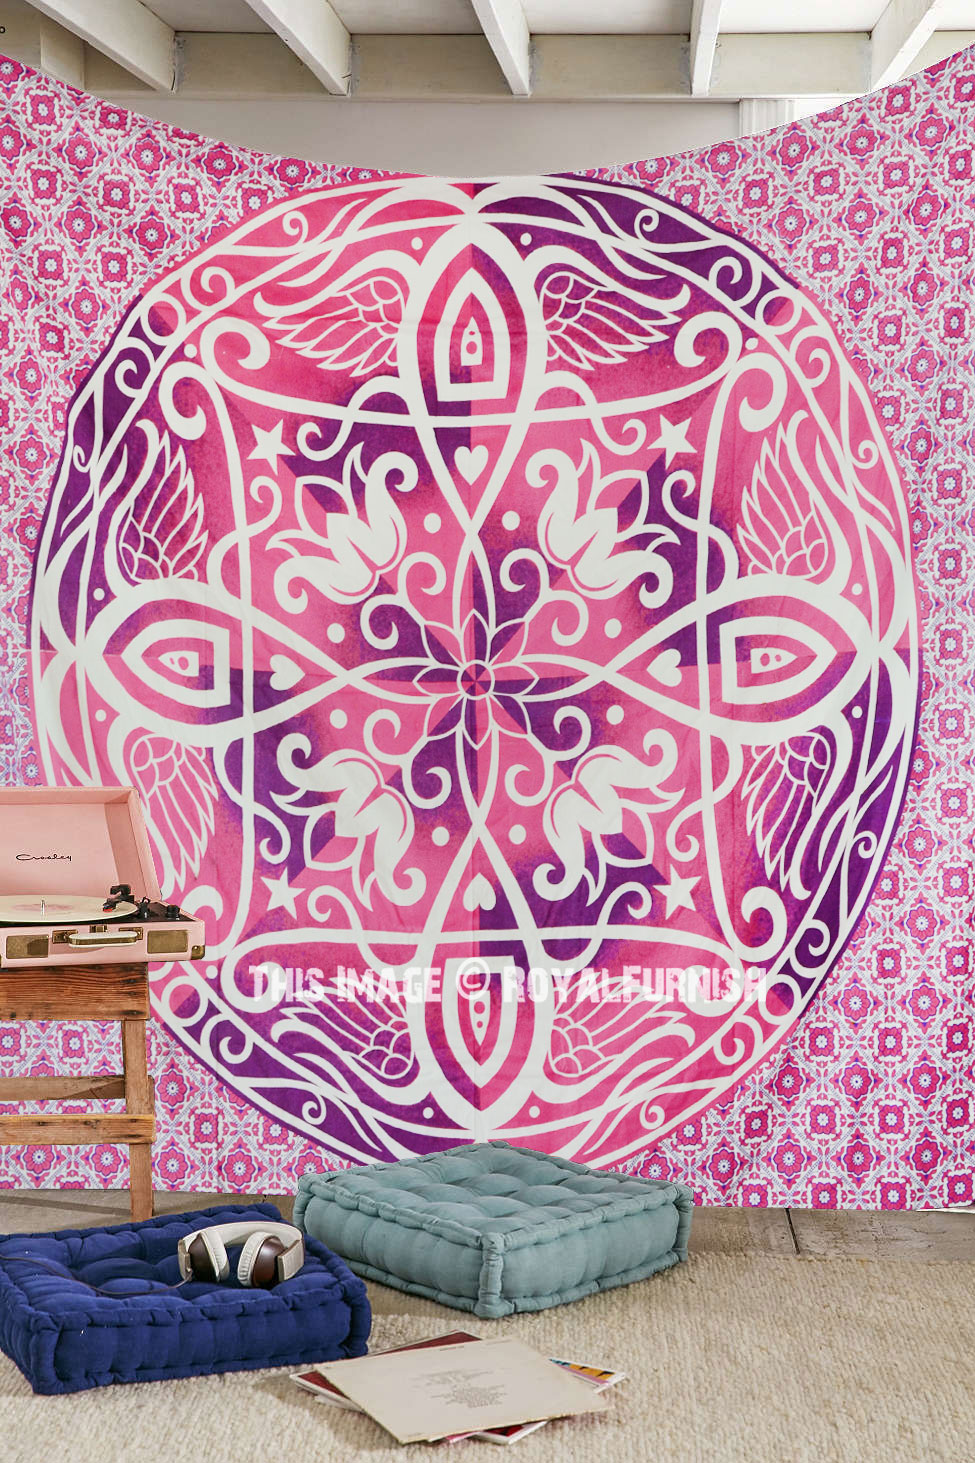 Blue multi elephants sun ombre mandala wall tapestry royalfurnish - Big Pink Symmetry Medallion Ombre Mandala Wall Tapestry